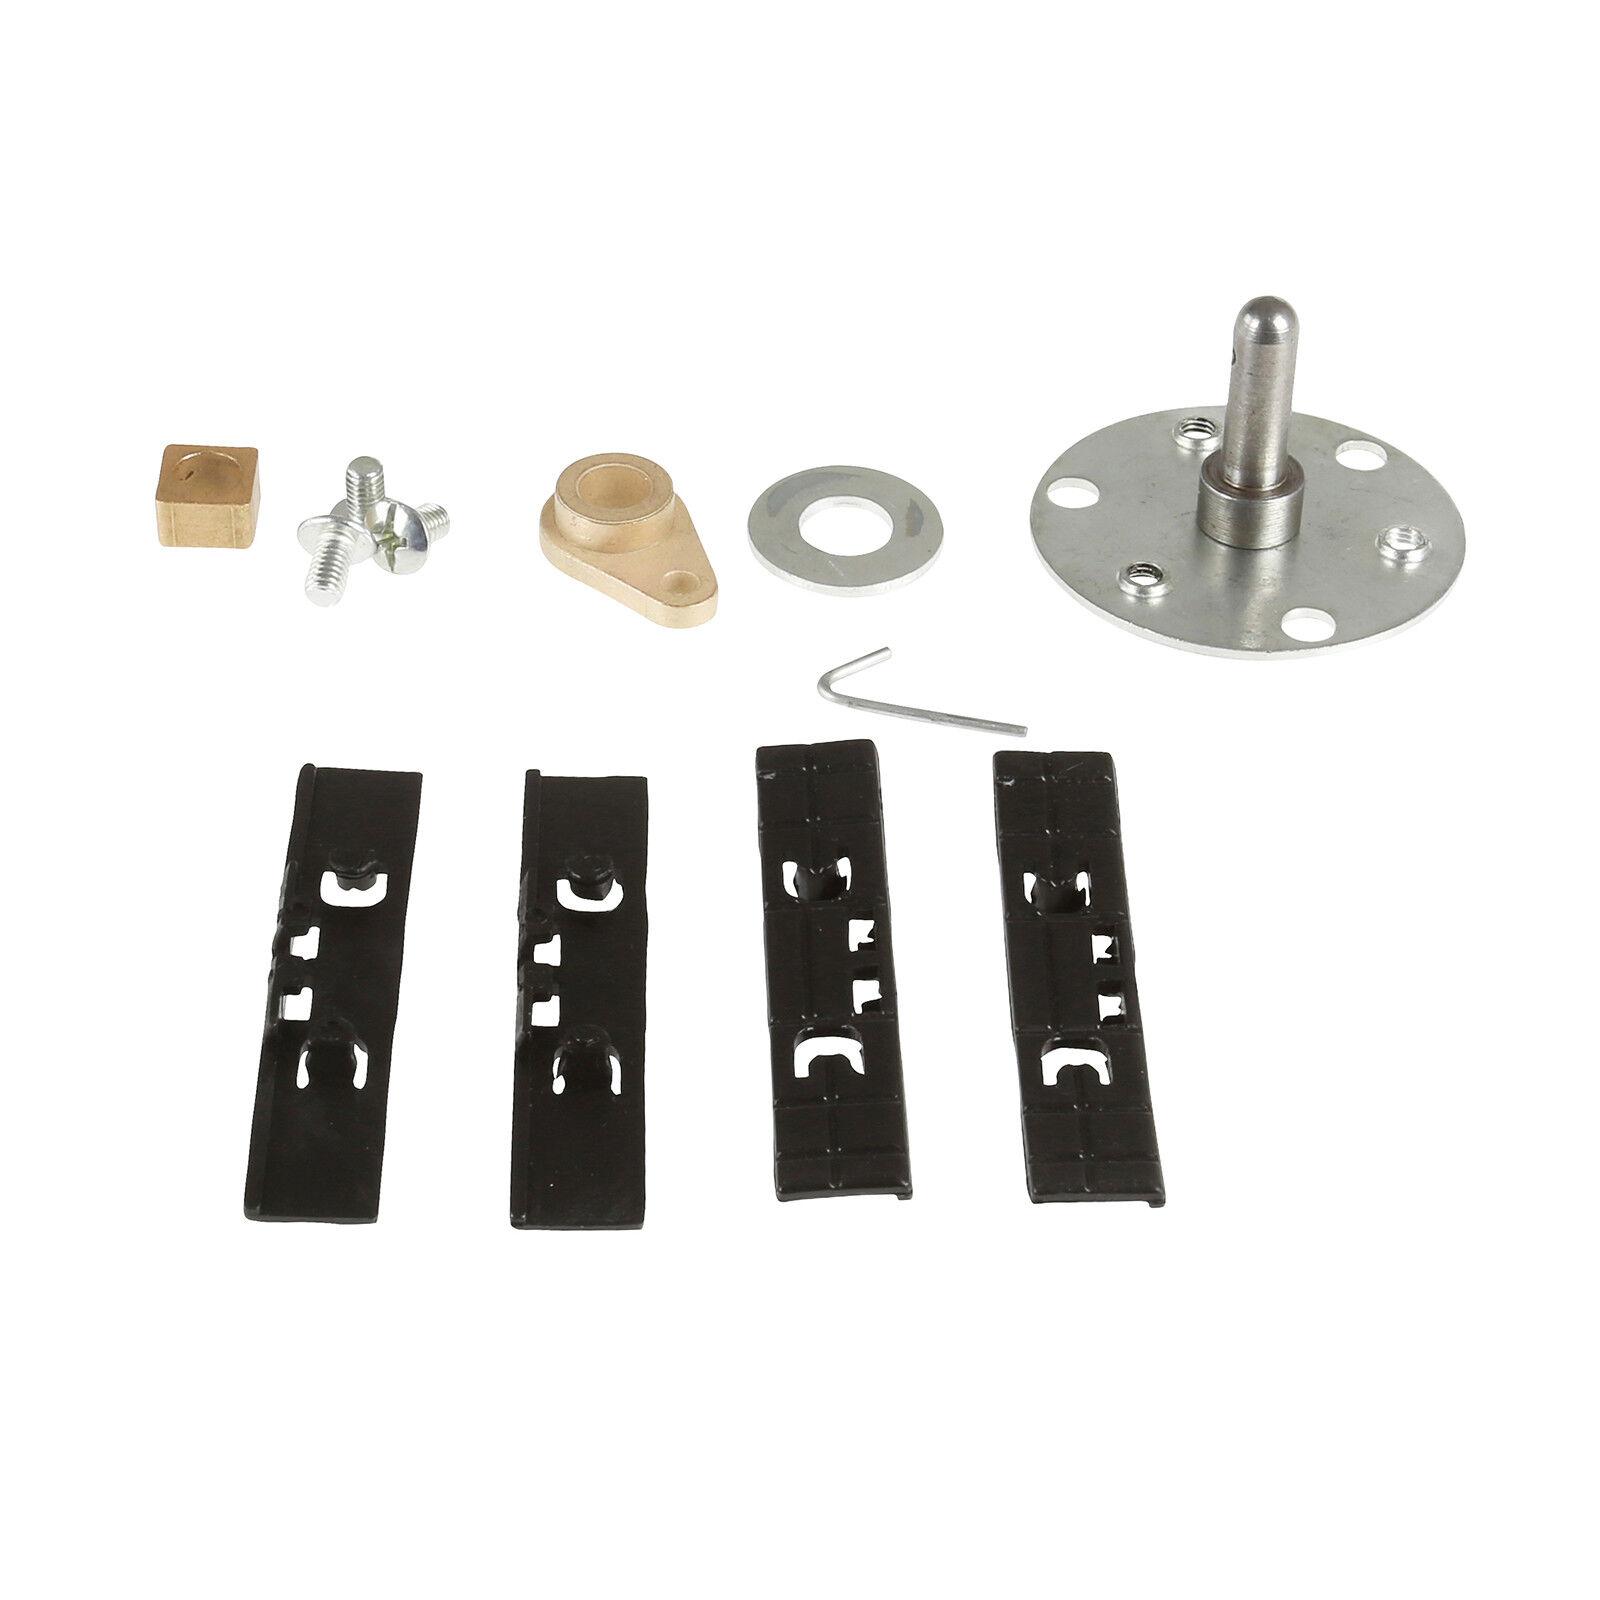 Hotpoint VTD20P VTD20T Tumble Dryer Rear Drum Shaft Bearing Repair Kit *NEW*